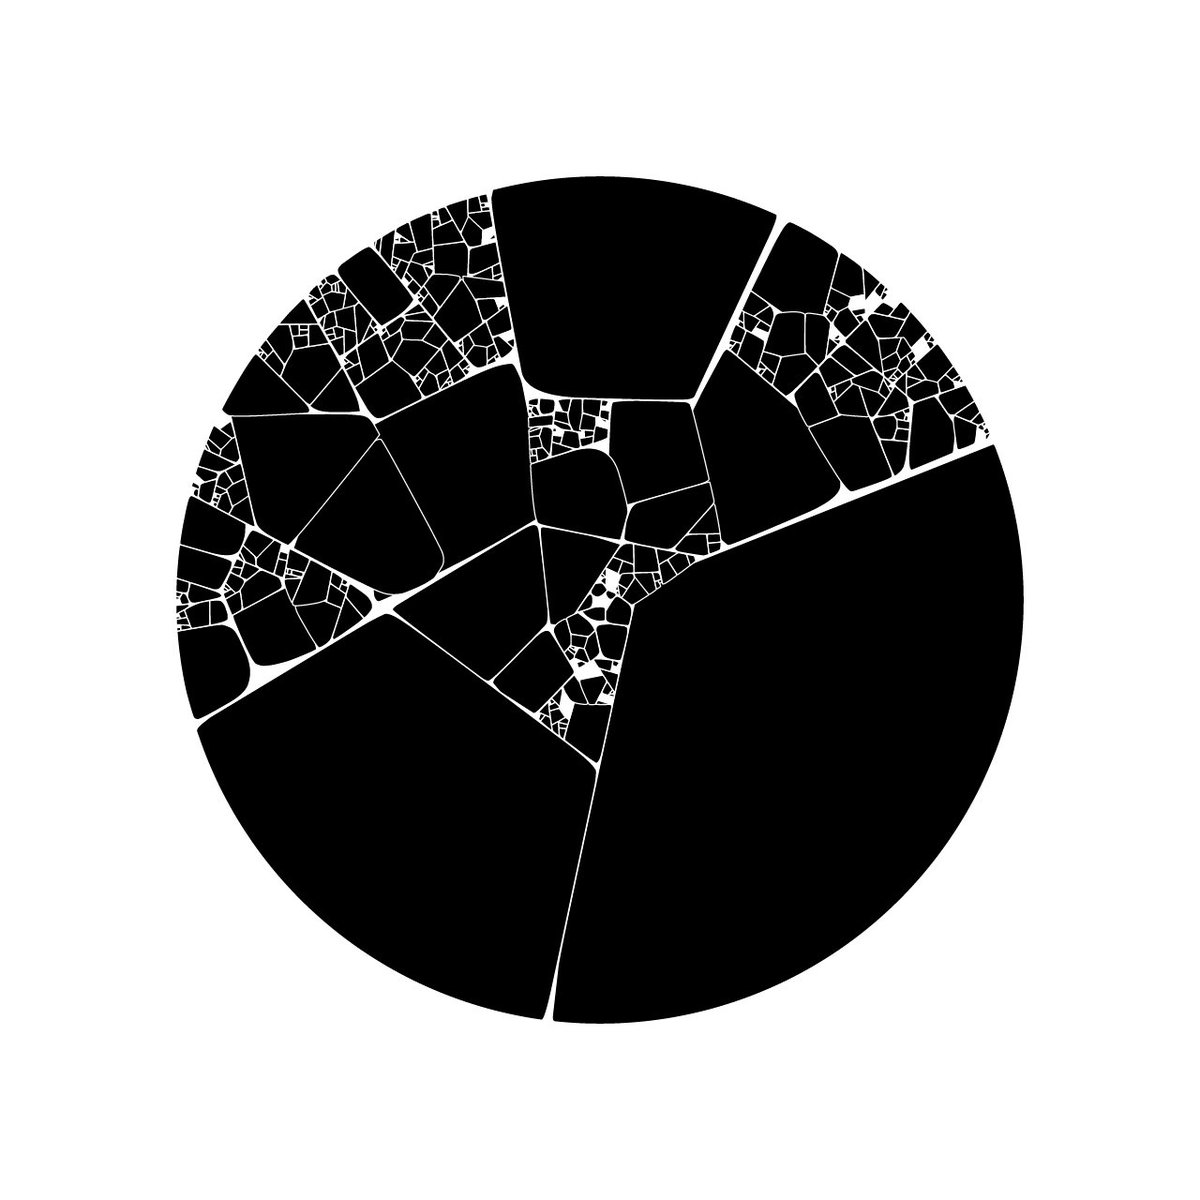 Matt Deslauriers On Twitter Patchwork A Simple Algorithm For